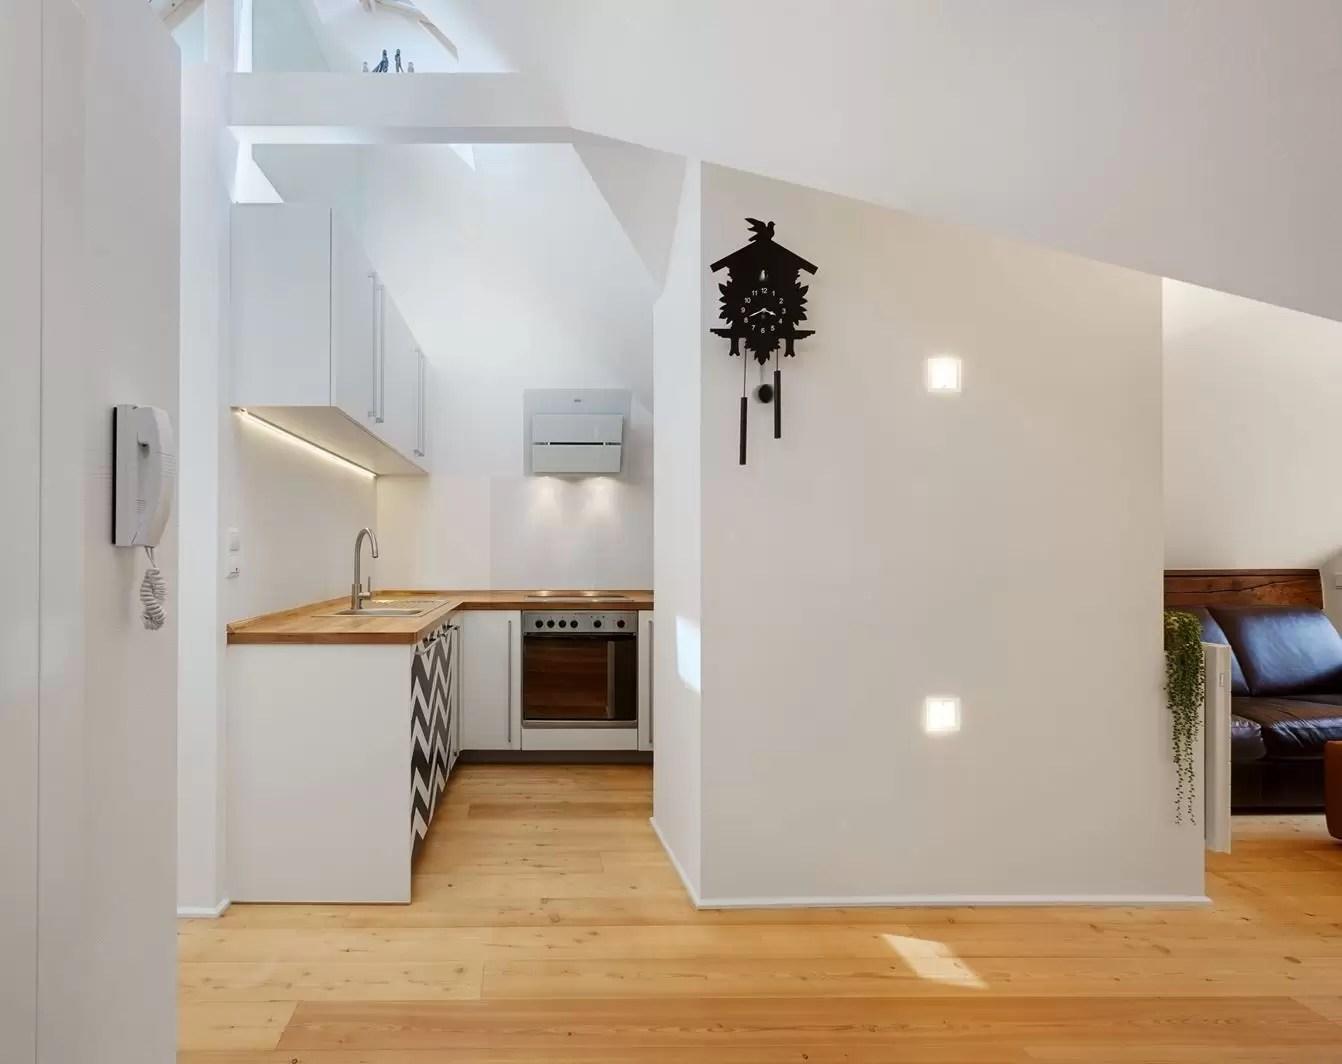 Un appartamento in una mini mansarda di 50 metri quadri  Mansardait